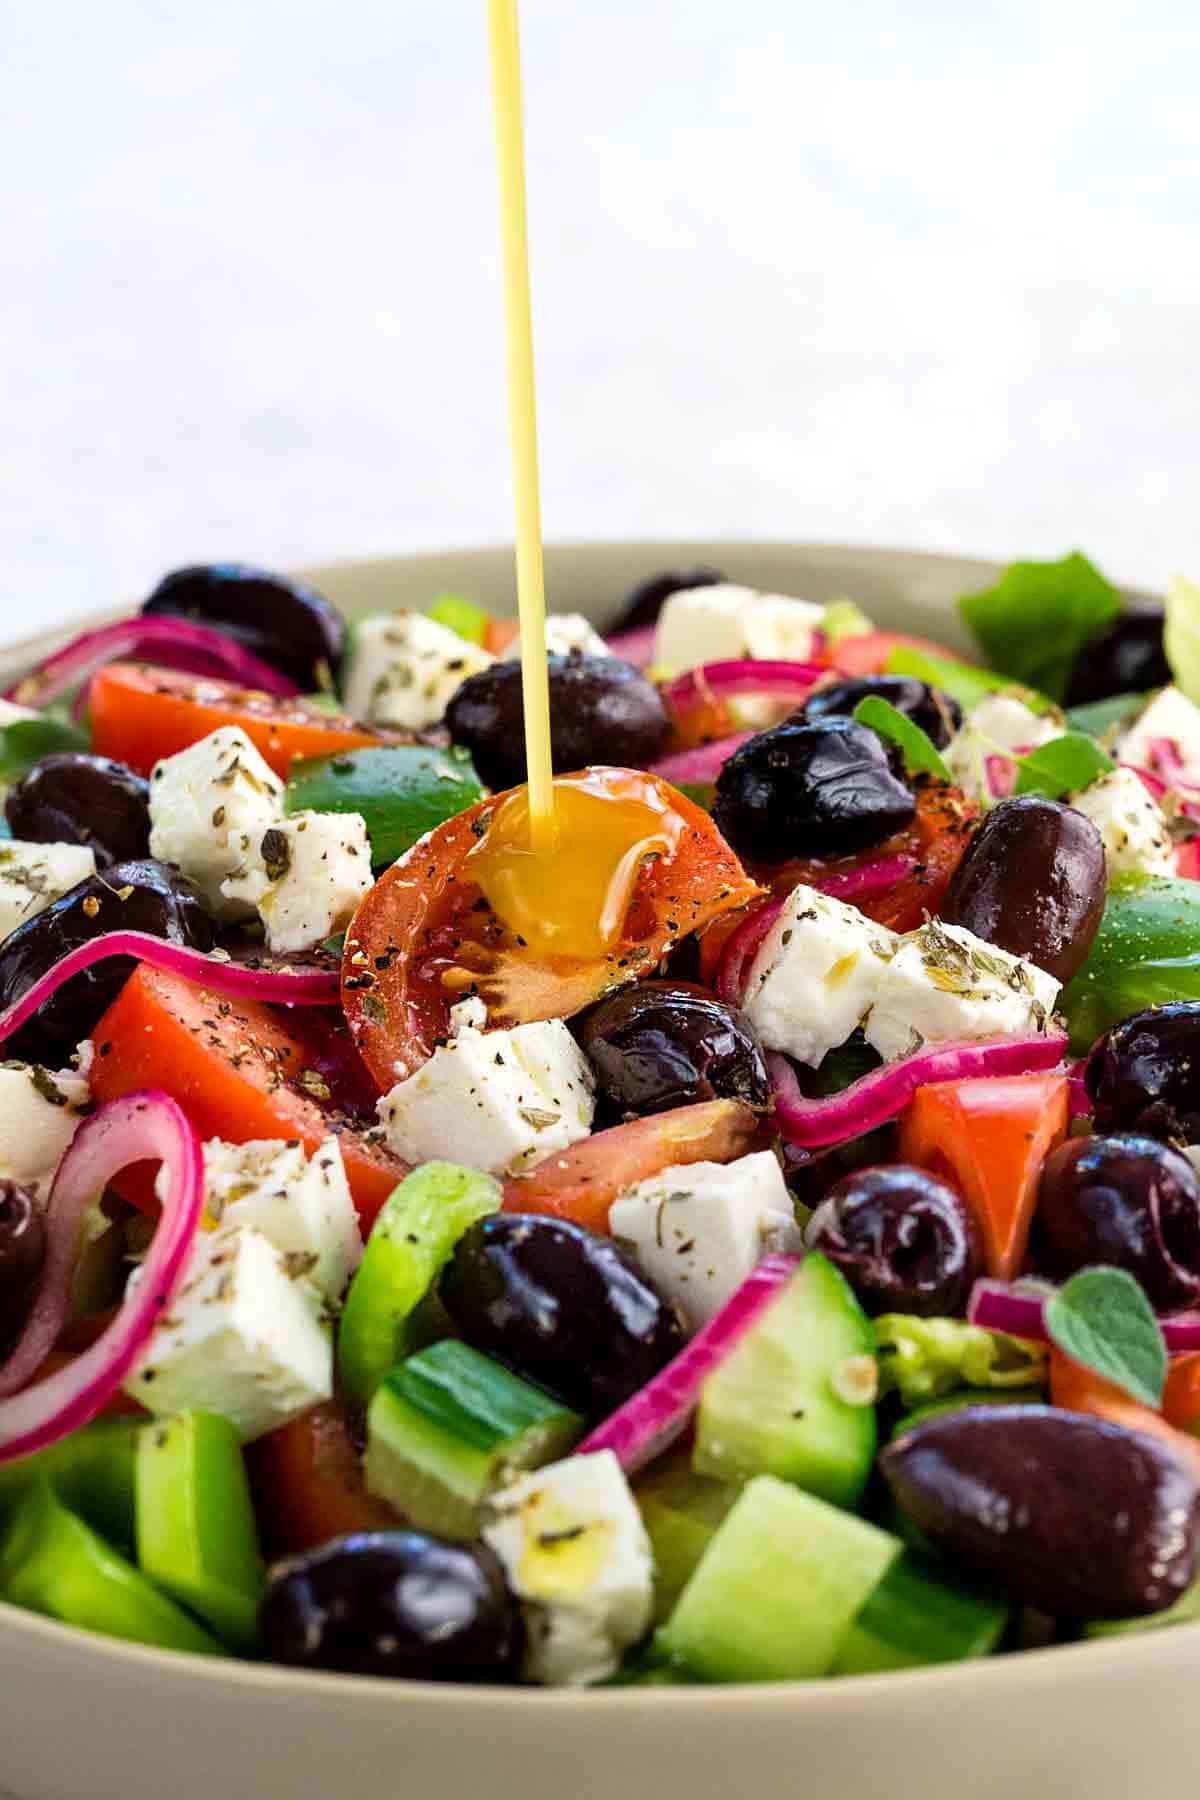 pouring salad dressing over a greek salad